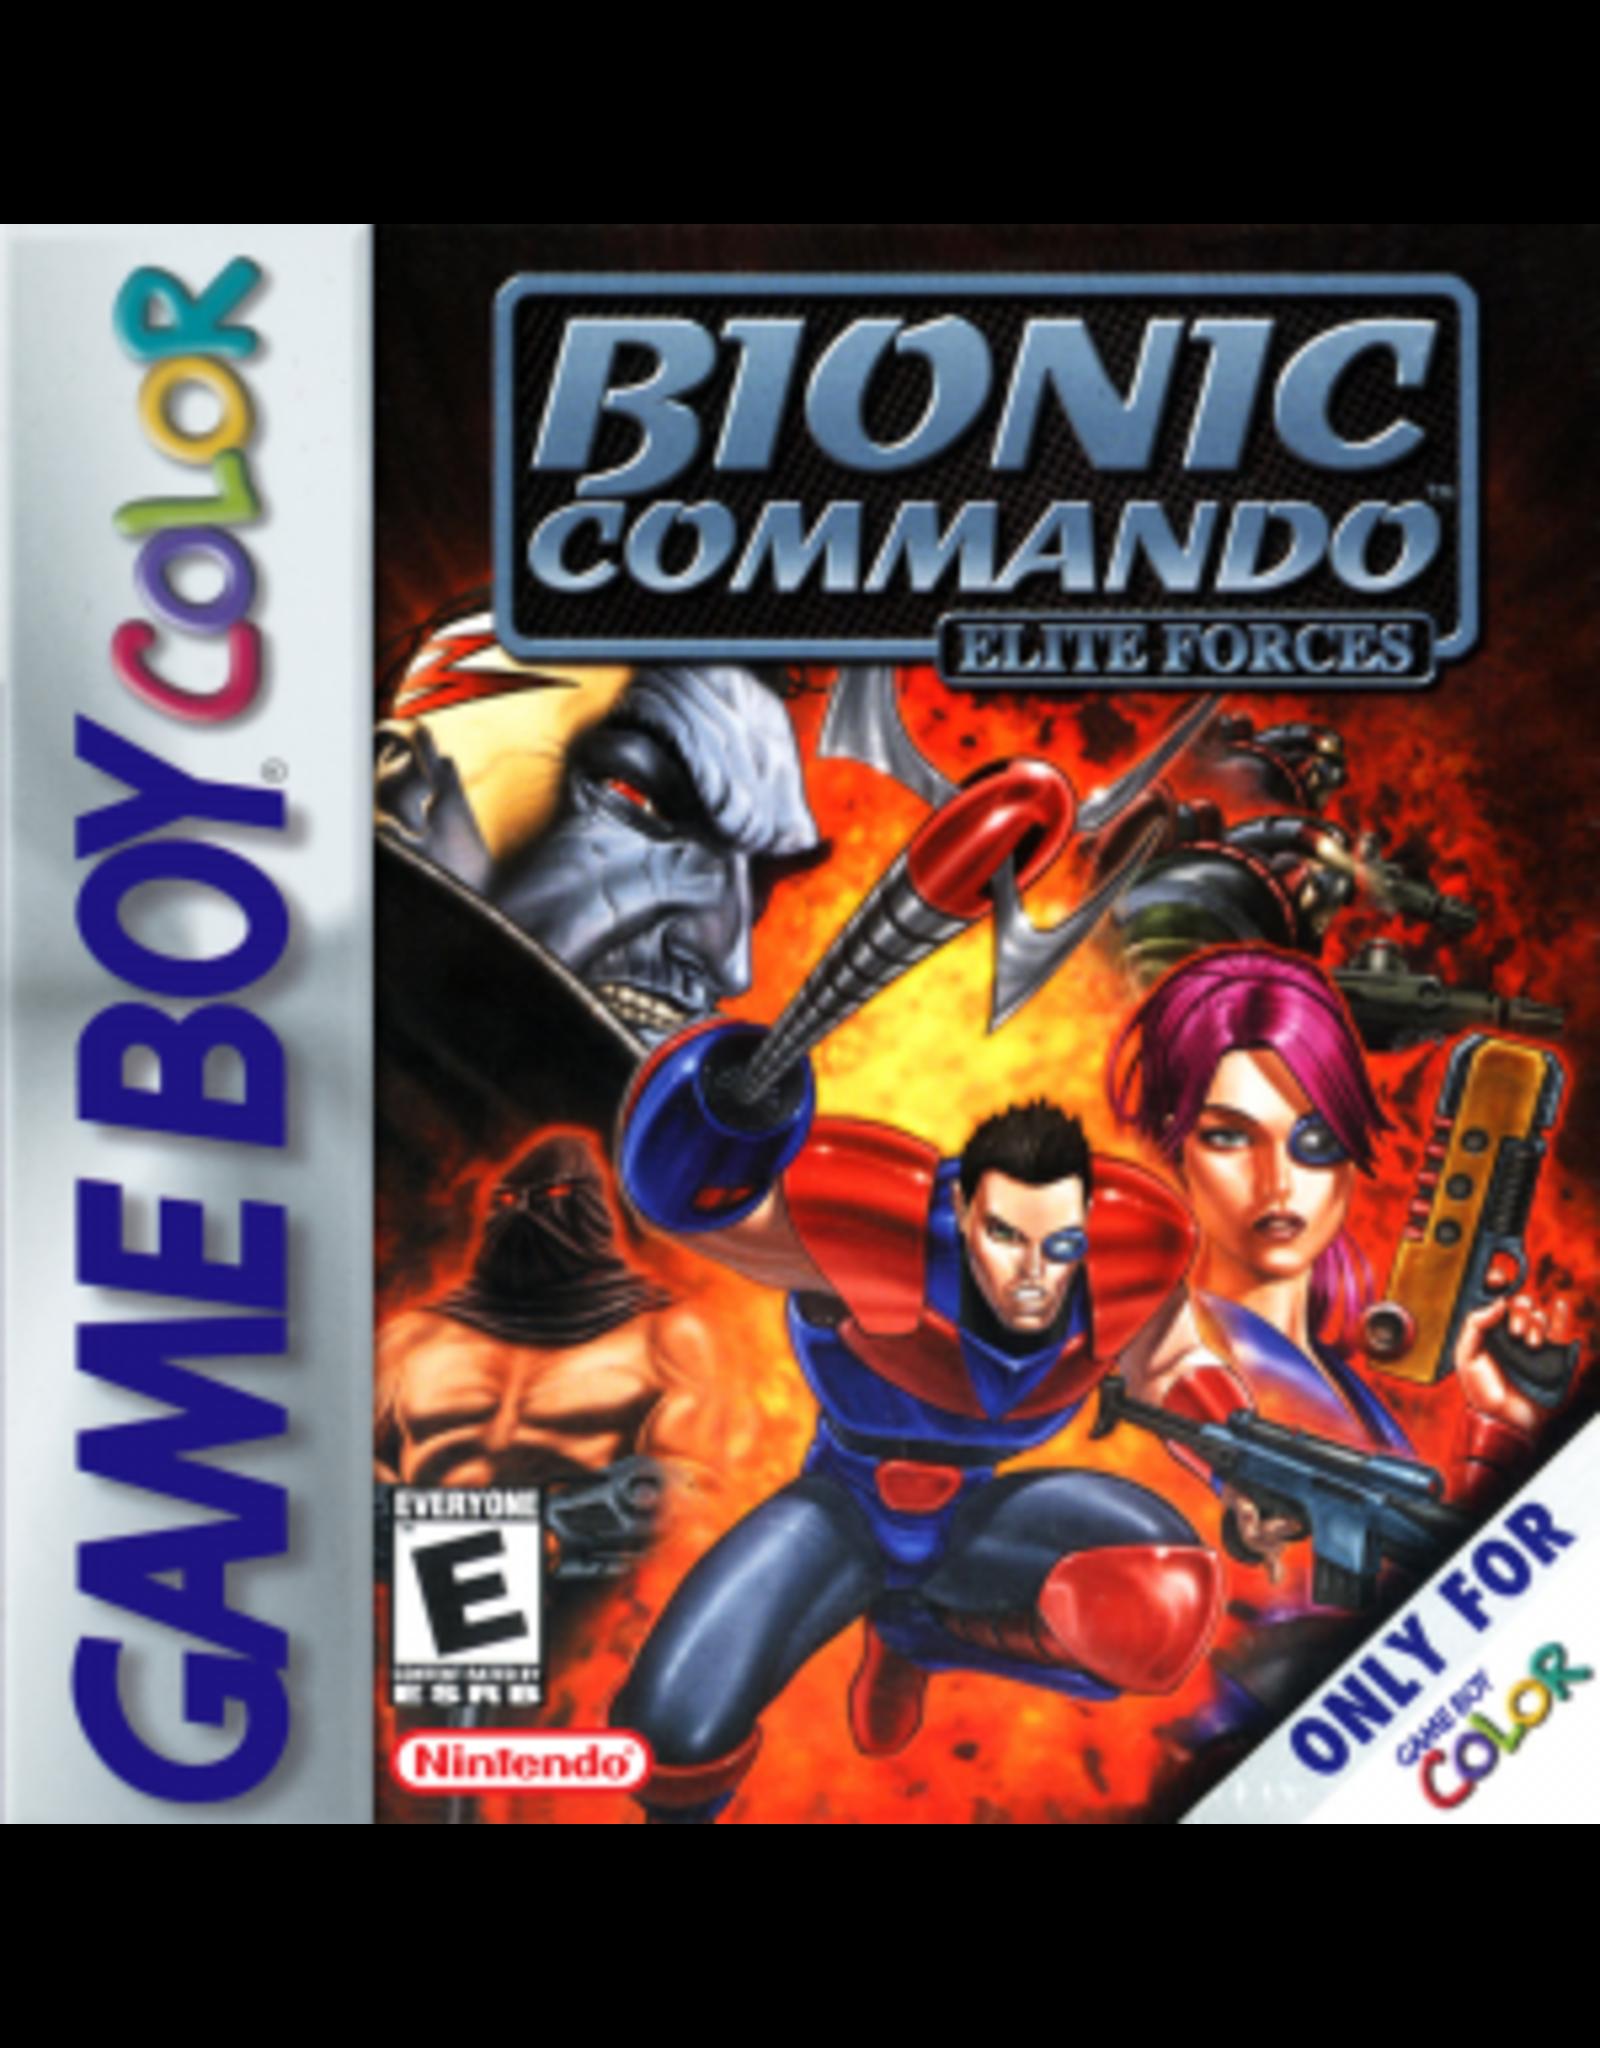 GameBoy Color Bionic Commando Elite Forces (Cart Only)